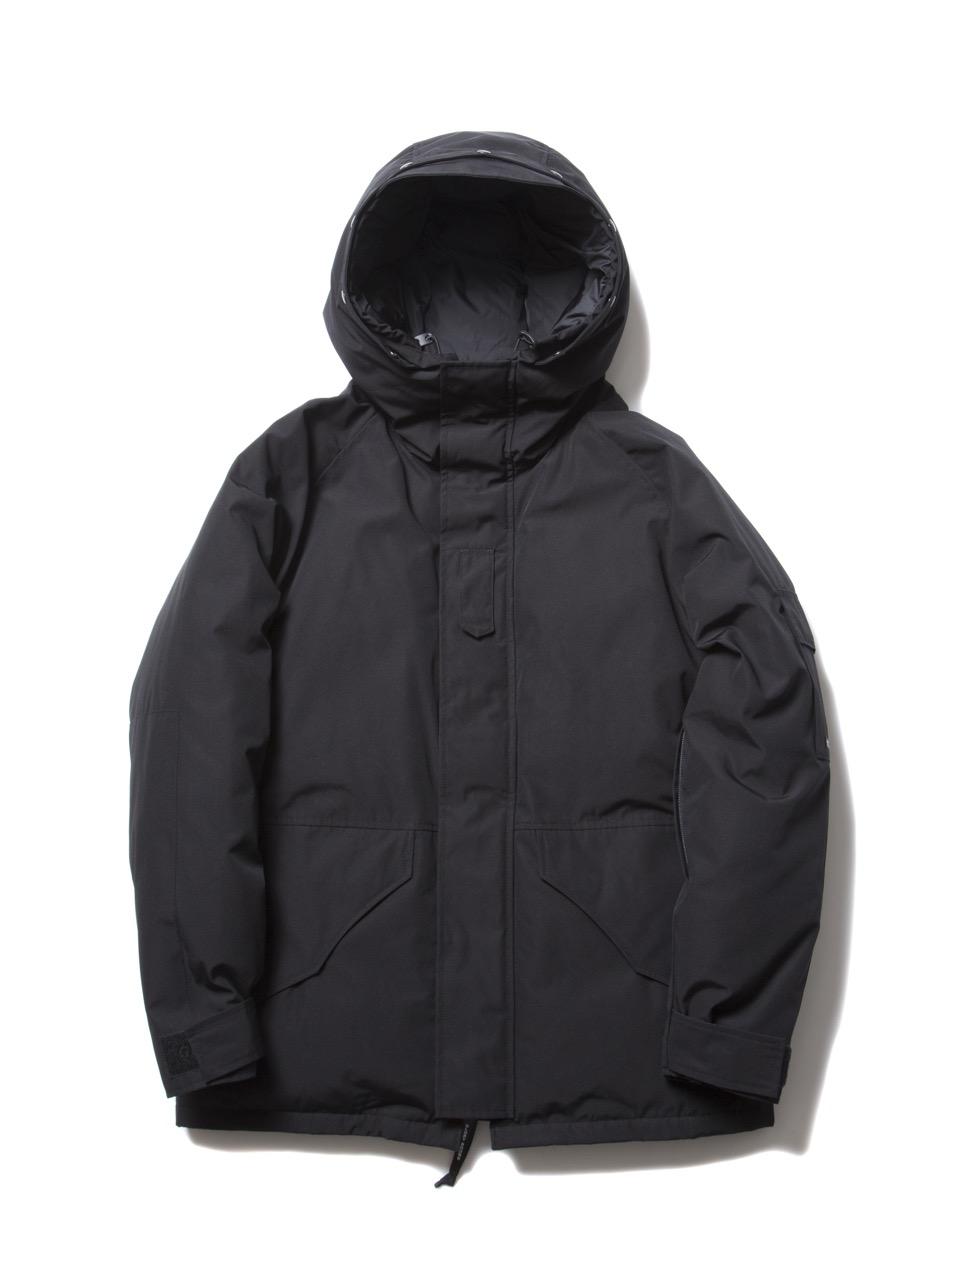 COOTIE T/C Weather Cloth Down Jacket